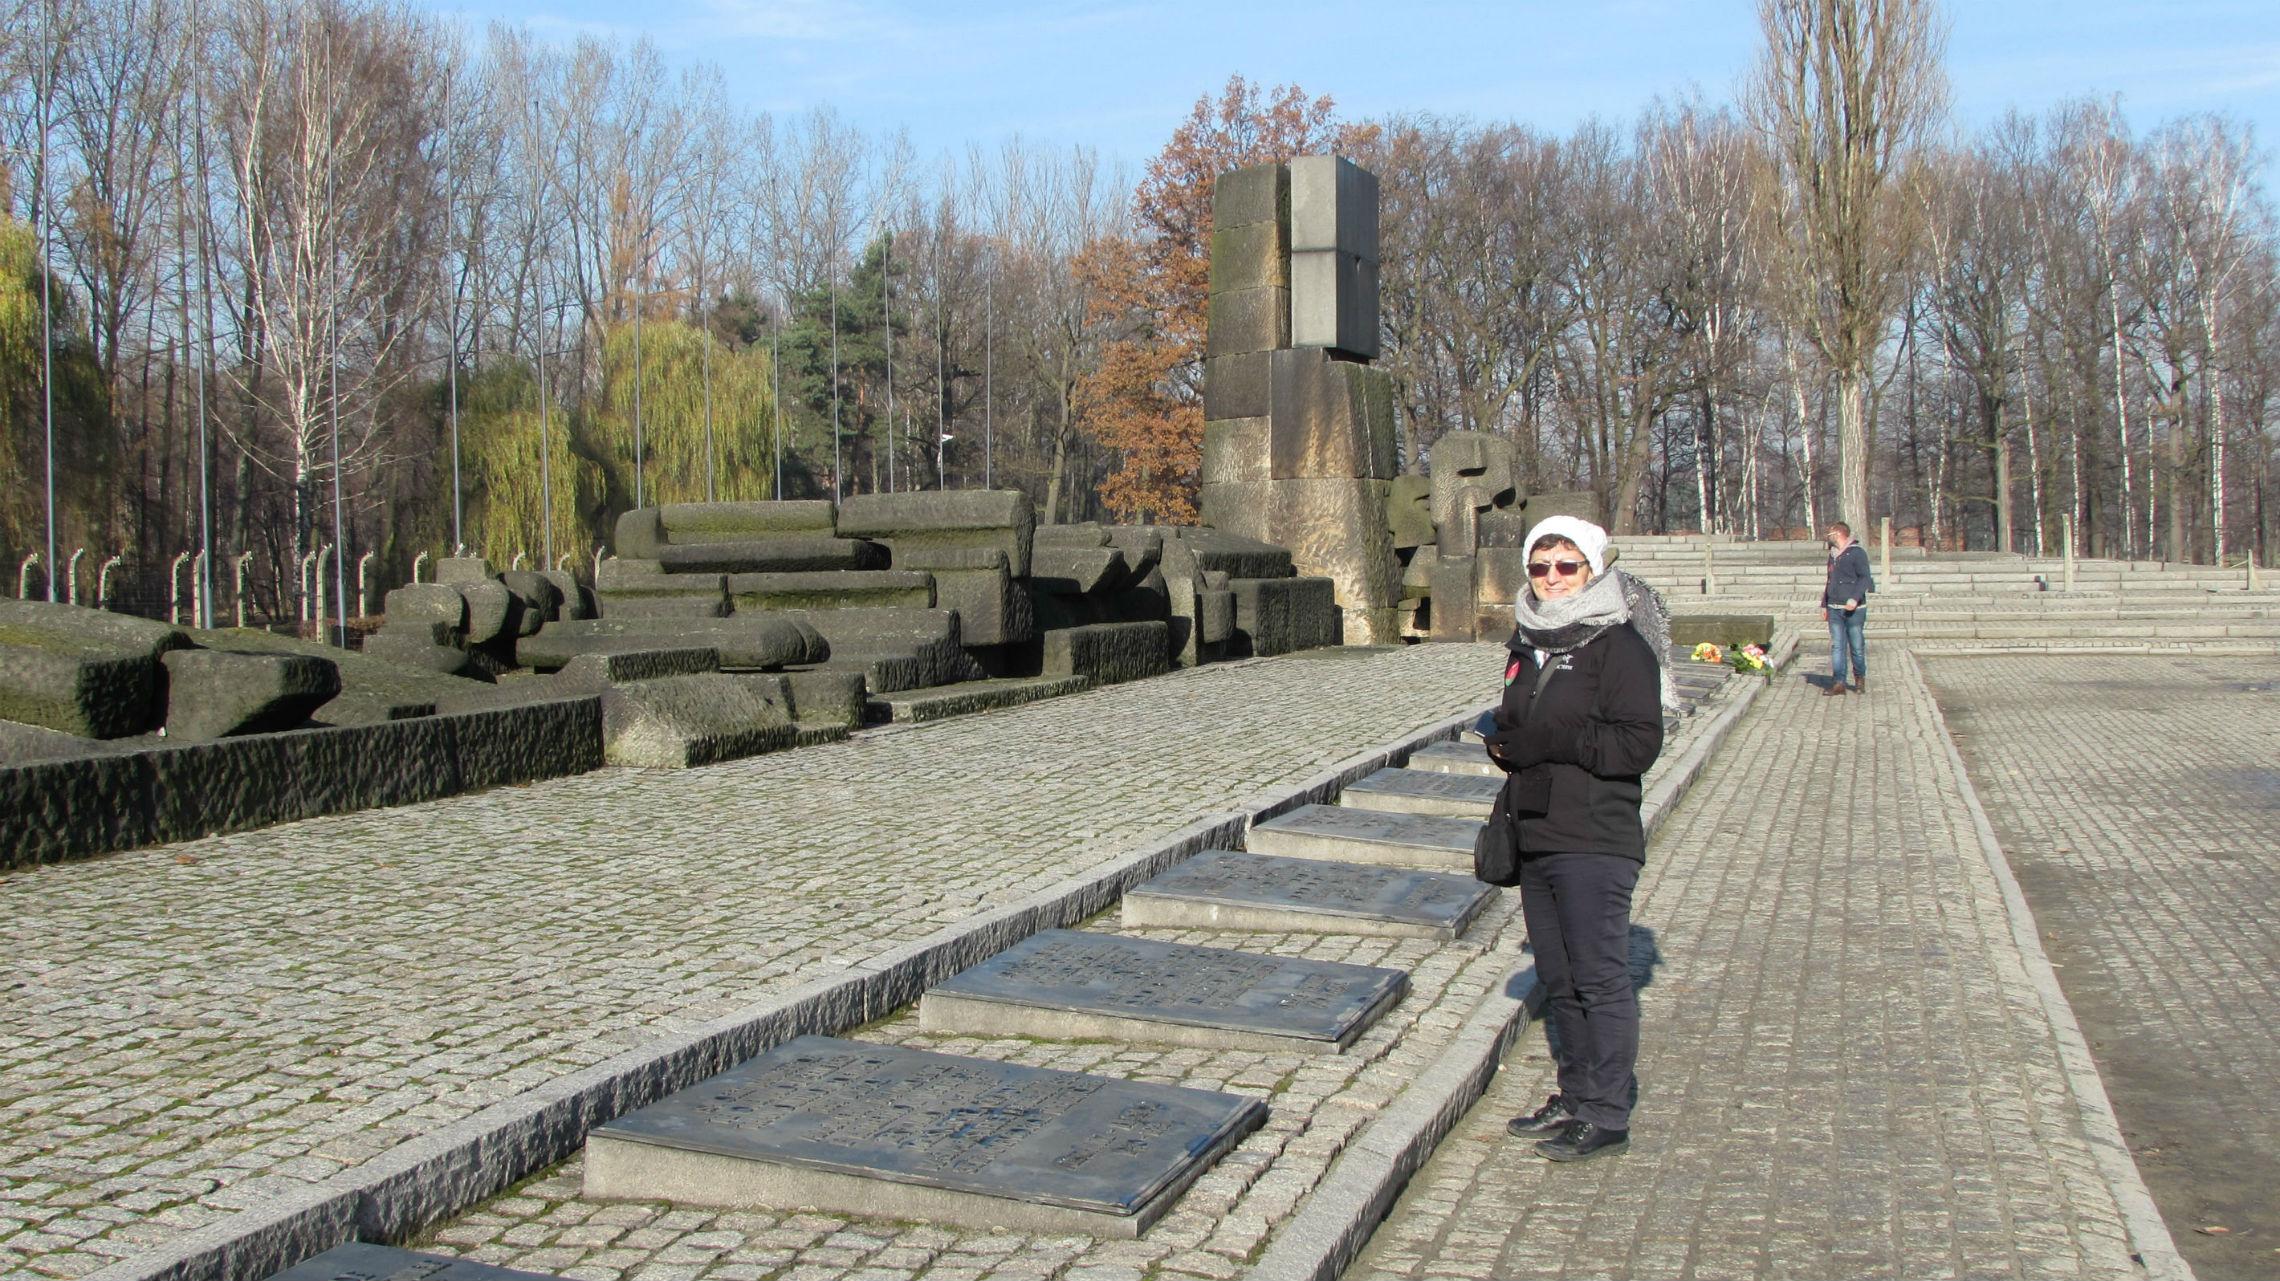 The International Monument of Auschwitz Birkenau